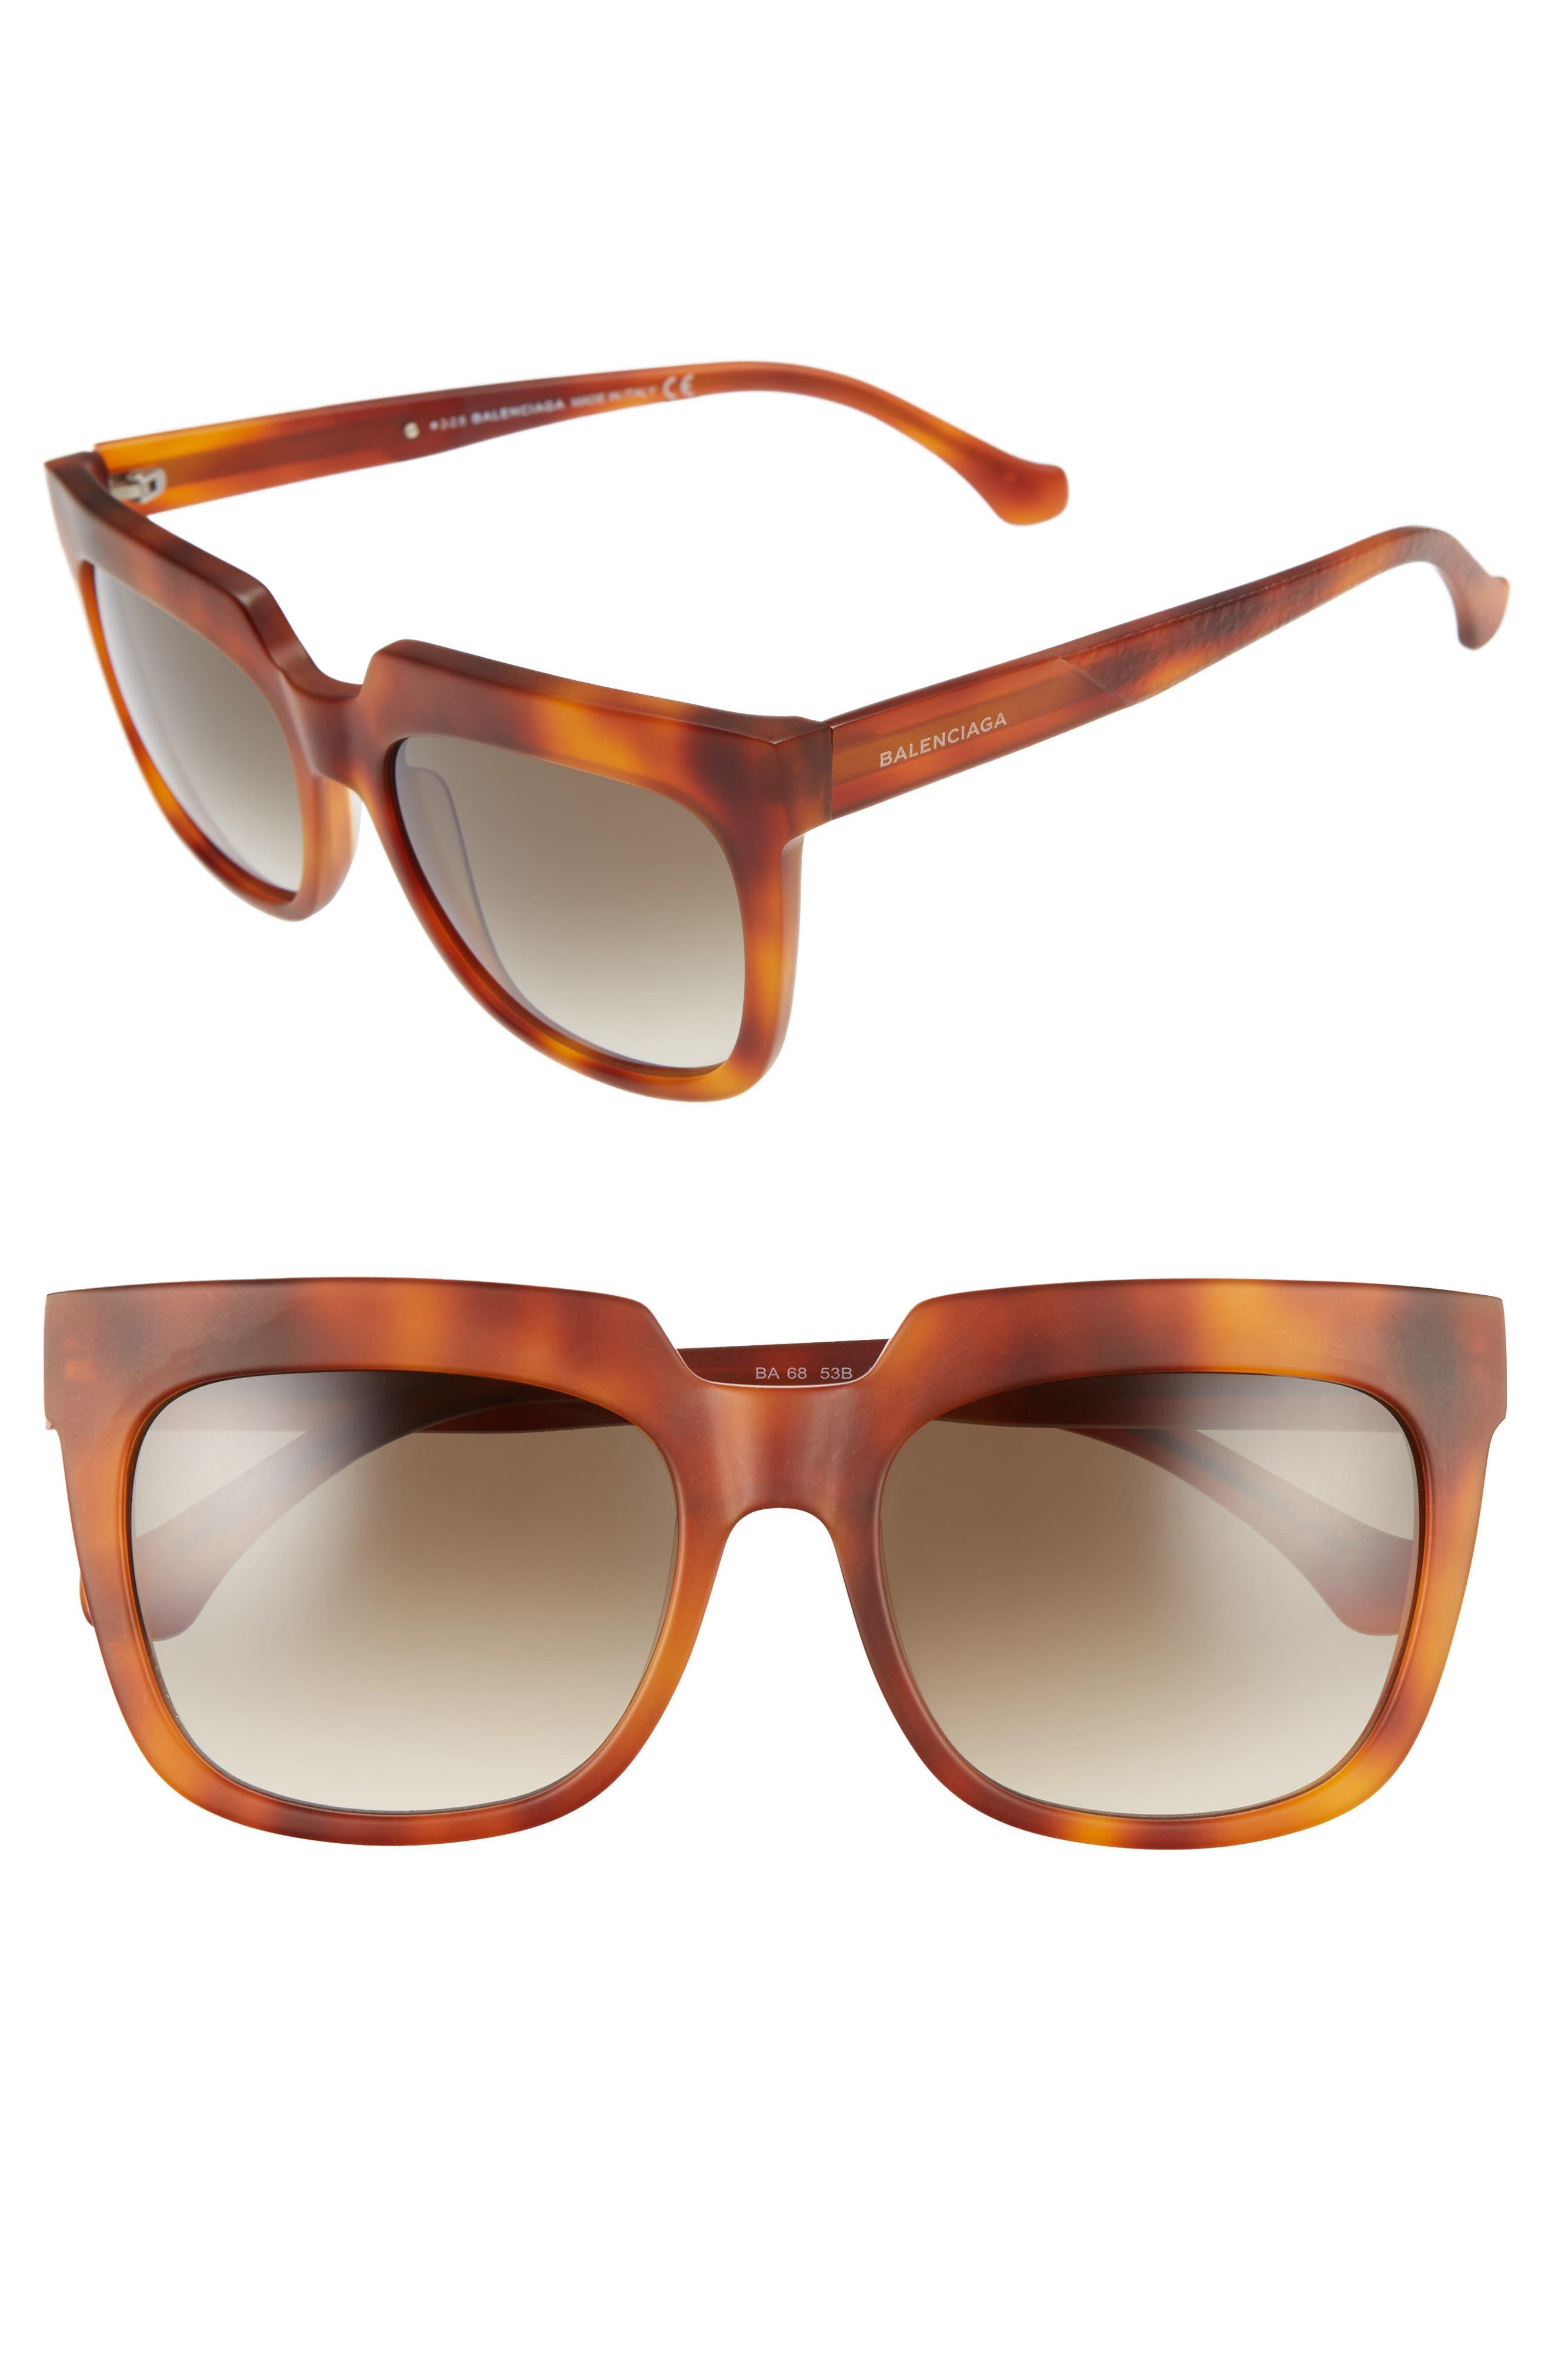 55mm Sunglasses,                             Alternate thumbnail 7, color,